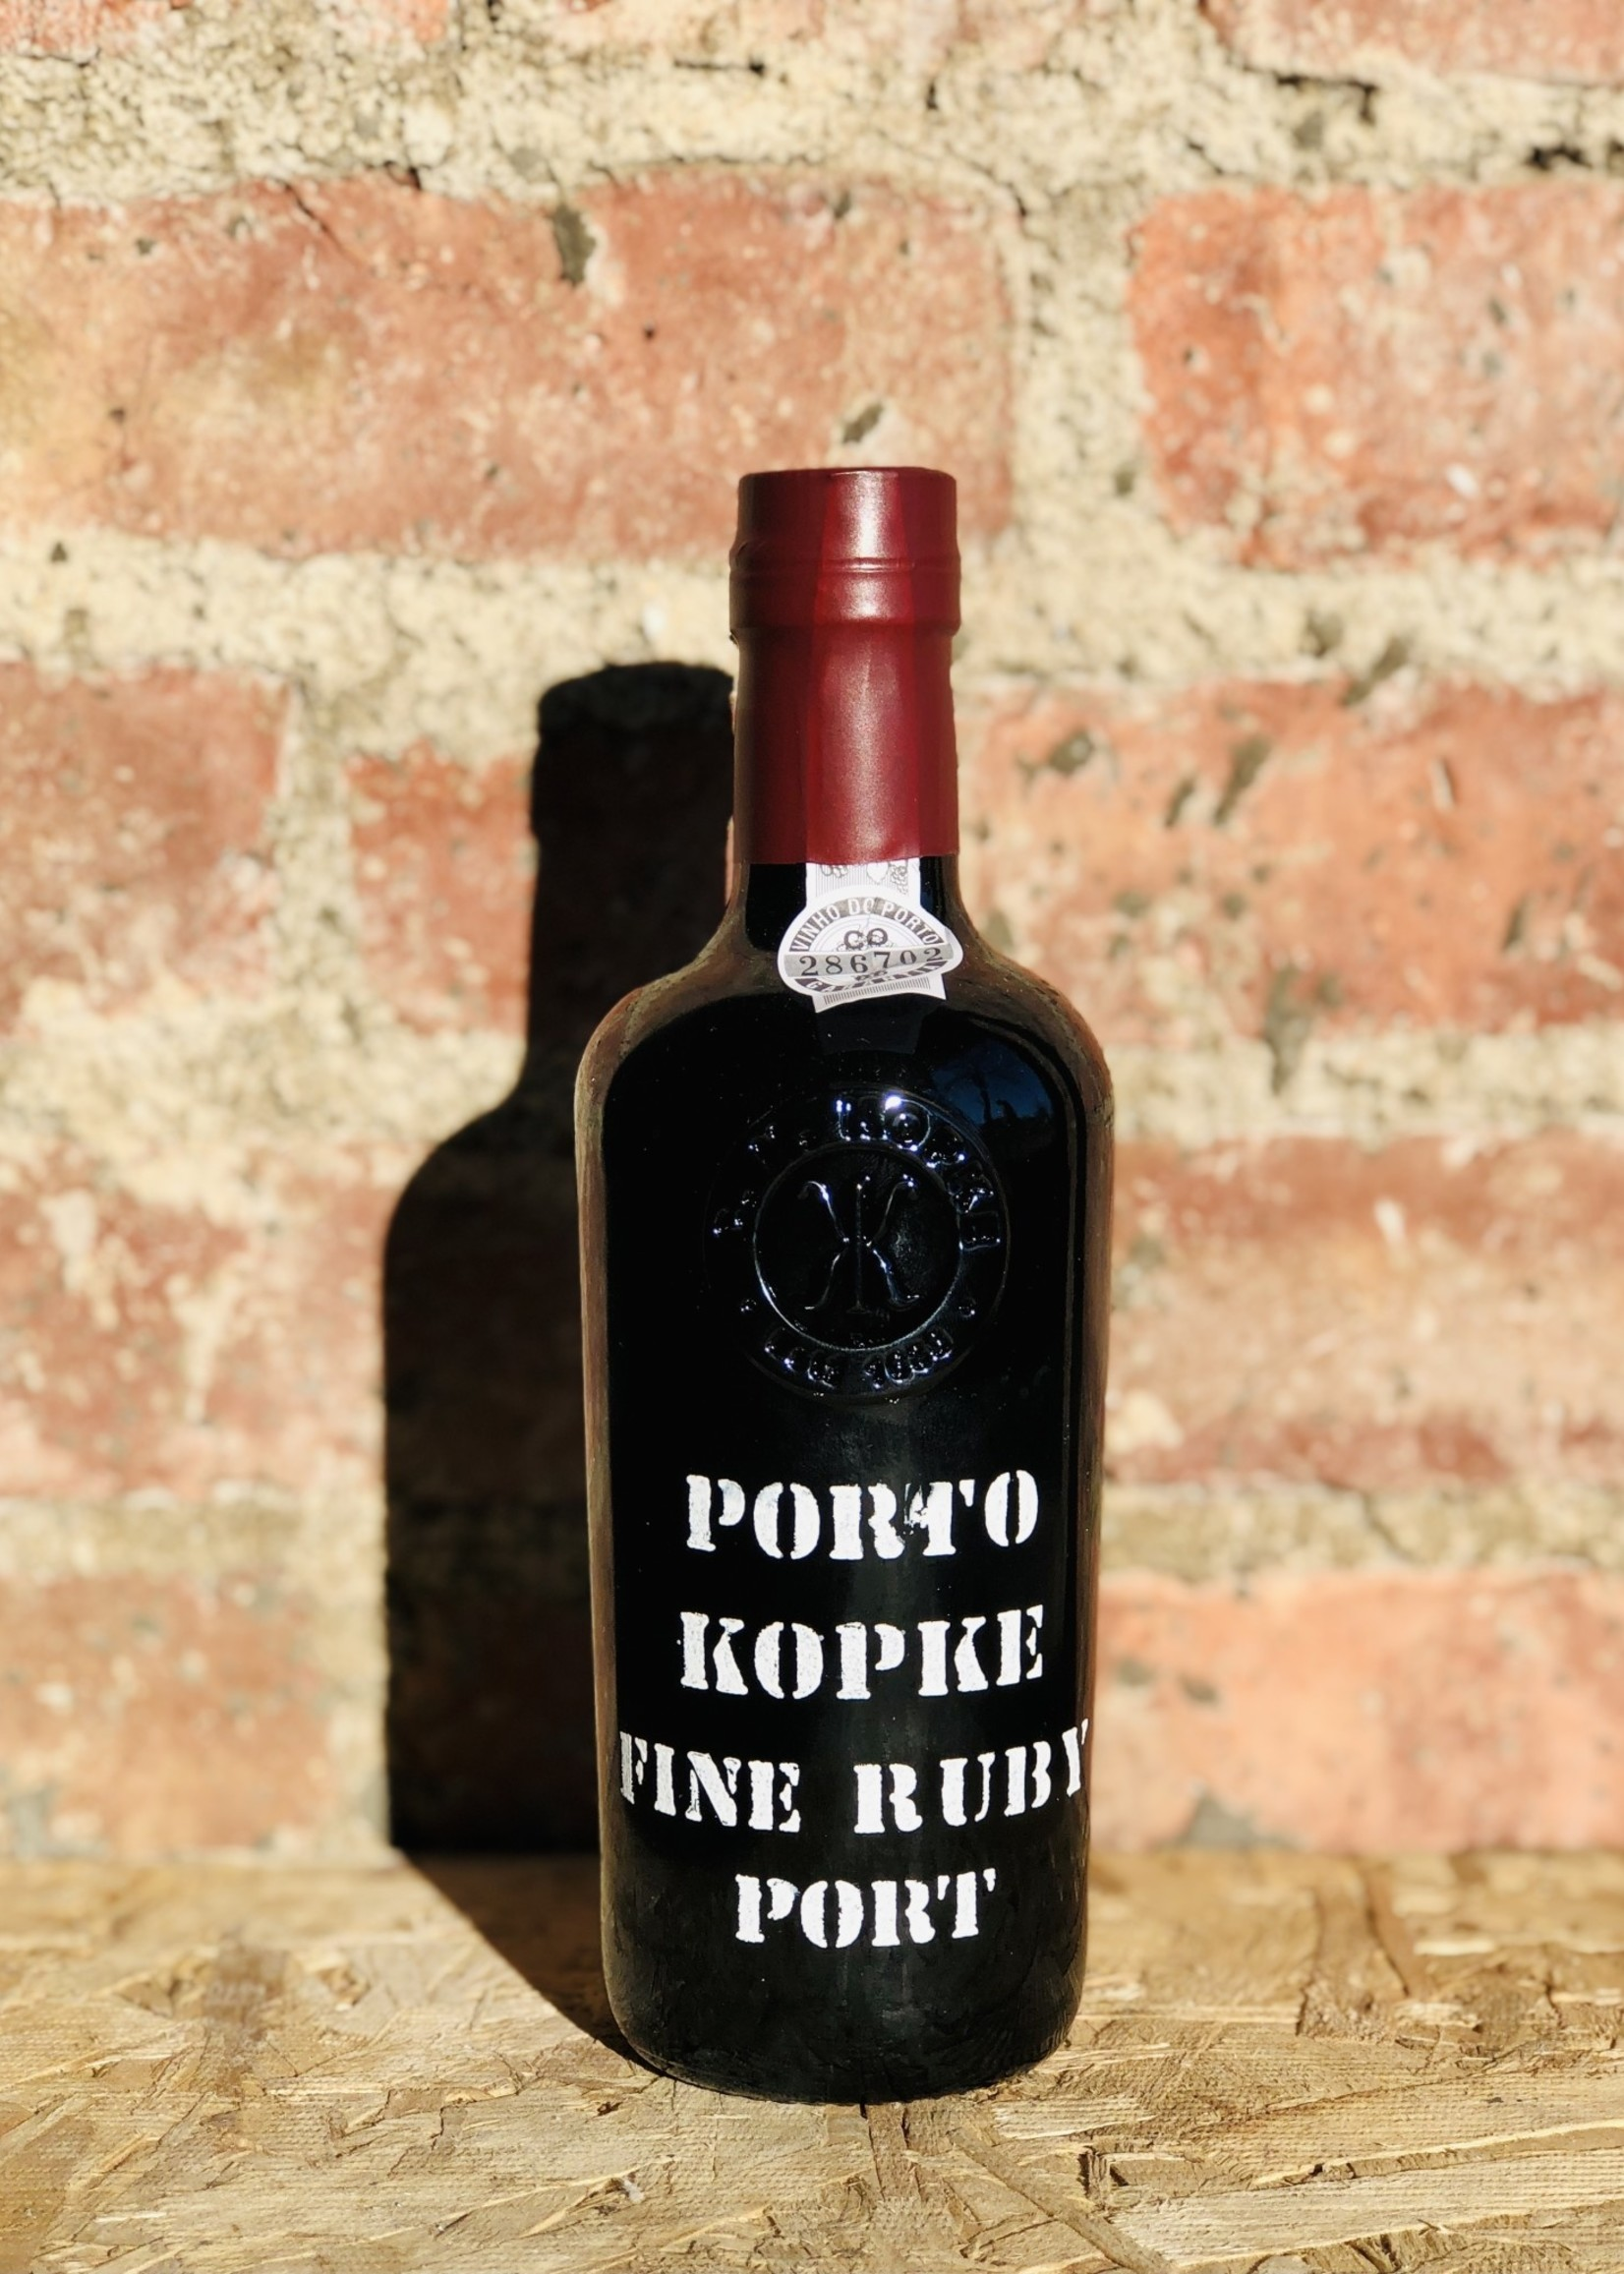 Kopke 1/2 Bottle  Fine Ruby Port [Porto Kopke Fine Ruby Port] (Douro, Portugal) NV